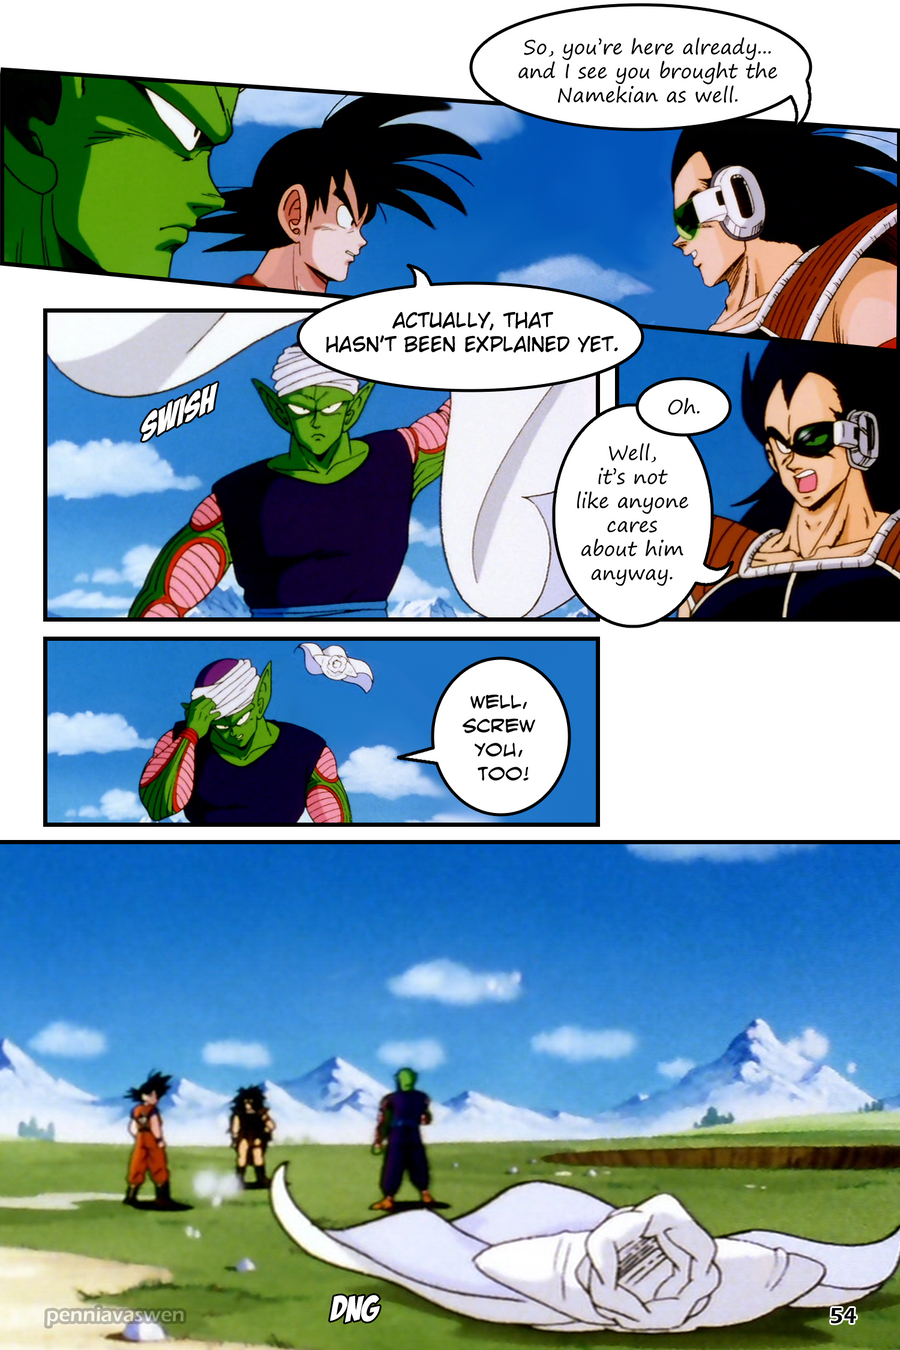 Funny Dragon Ball Z Abridged Memes : Dragonball z abridged the manga page by